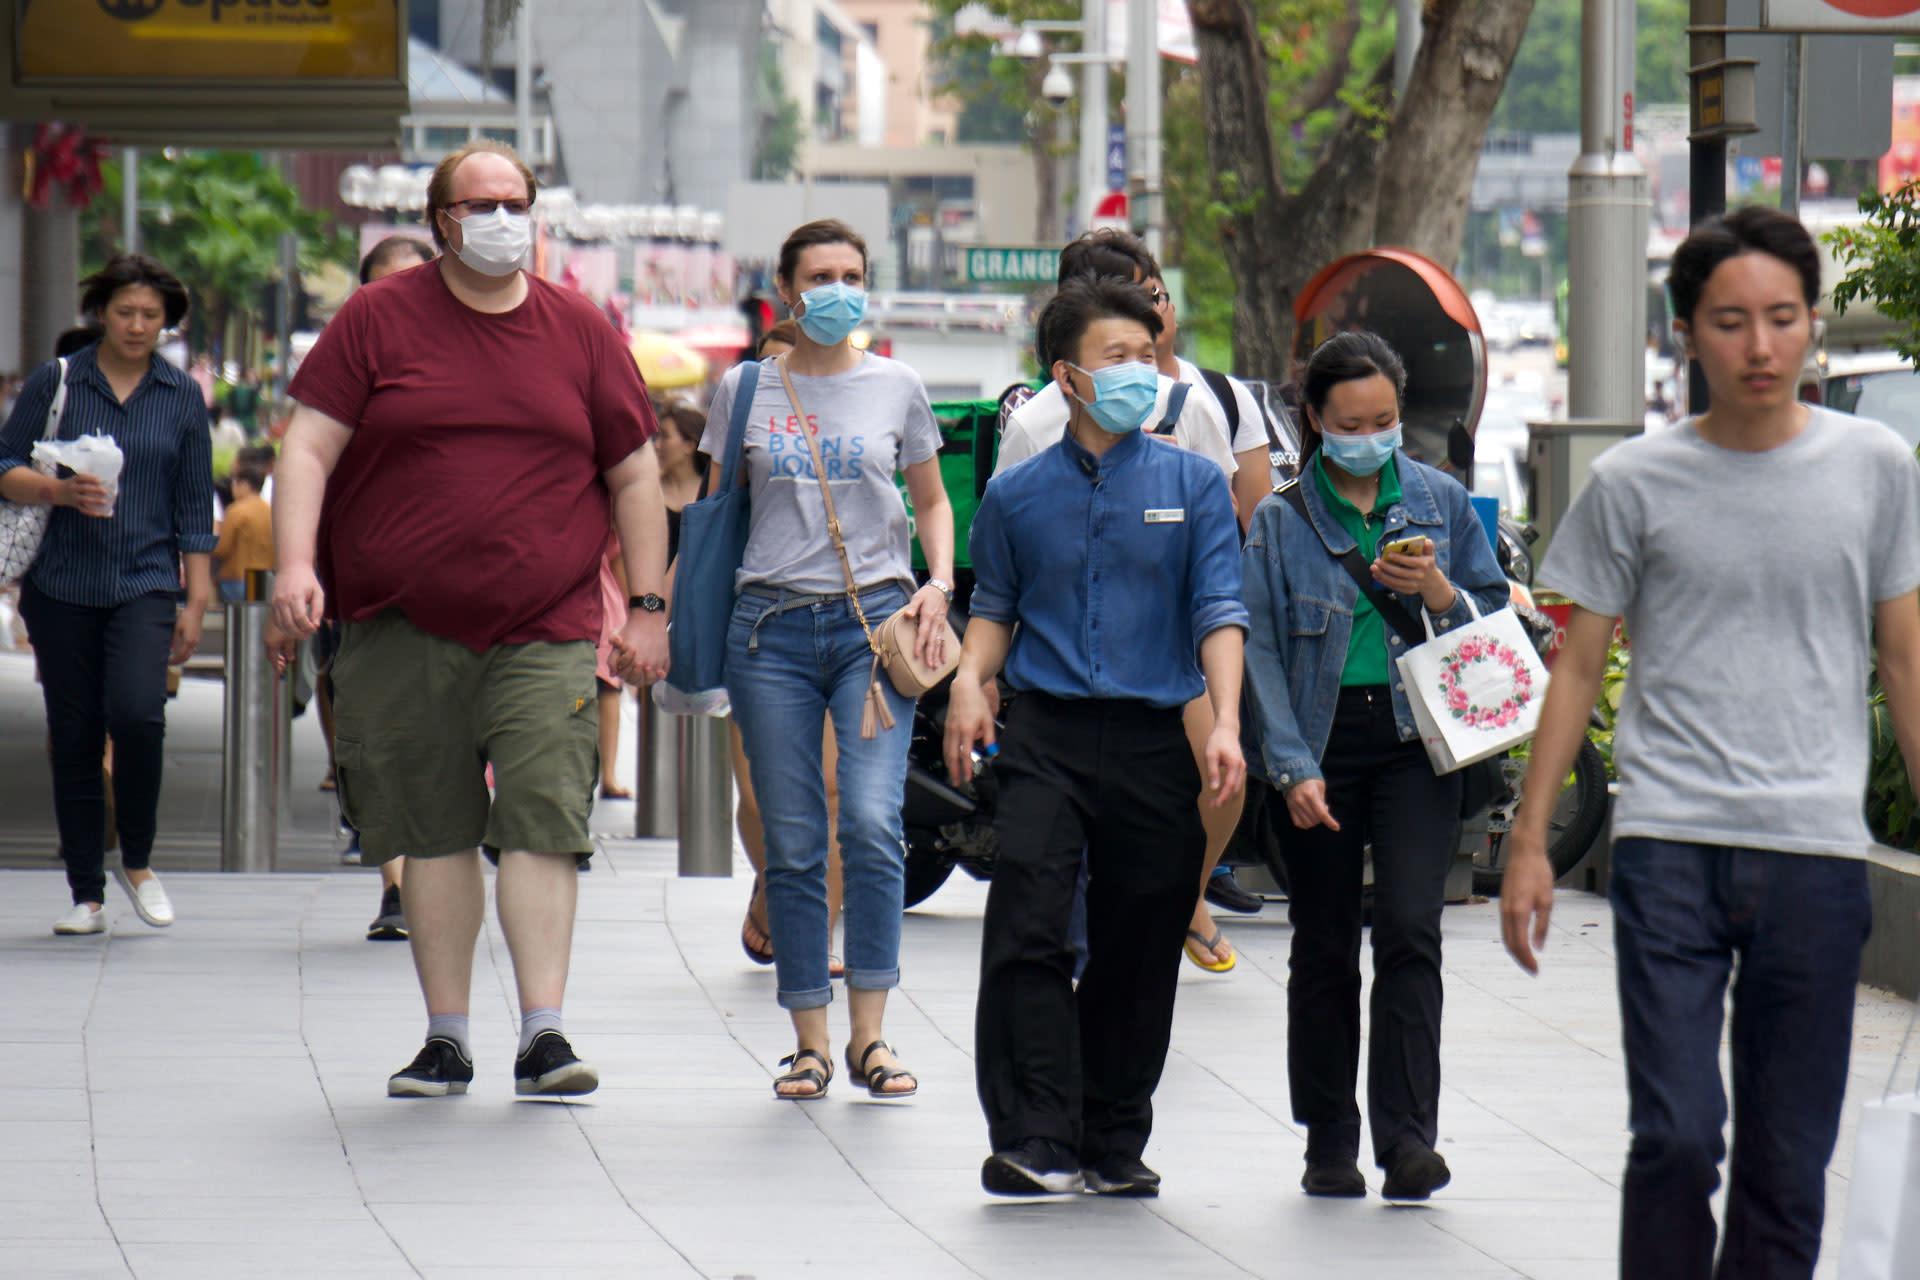 Singapore tourism cries 'help' as coronavirus hits arrivals